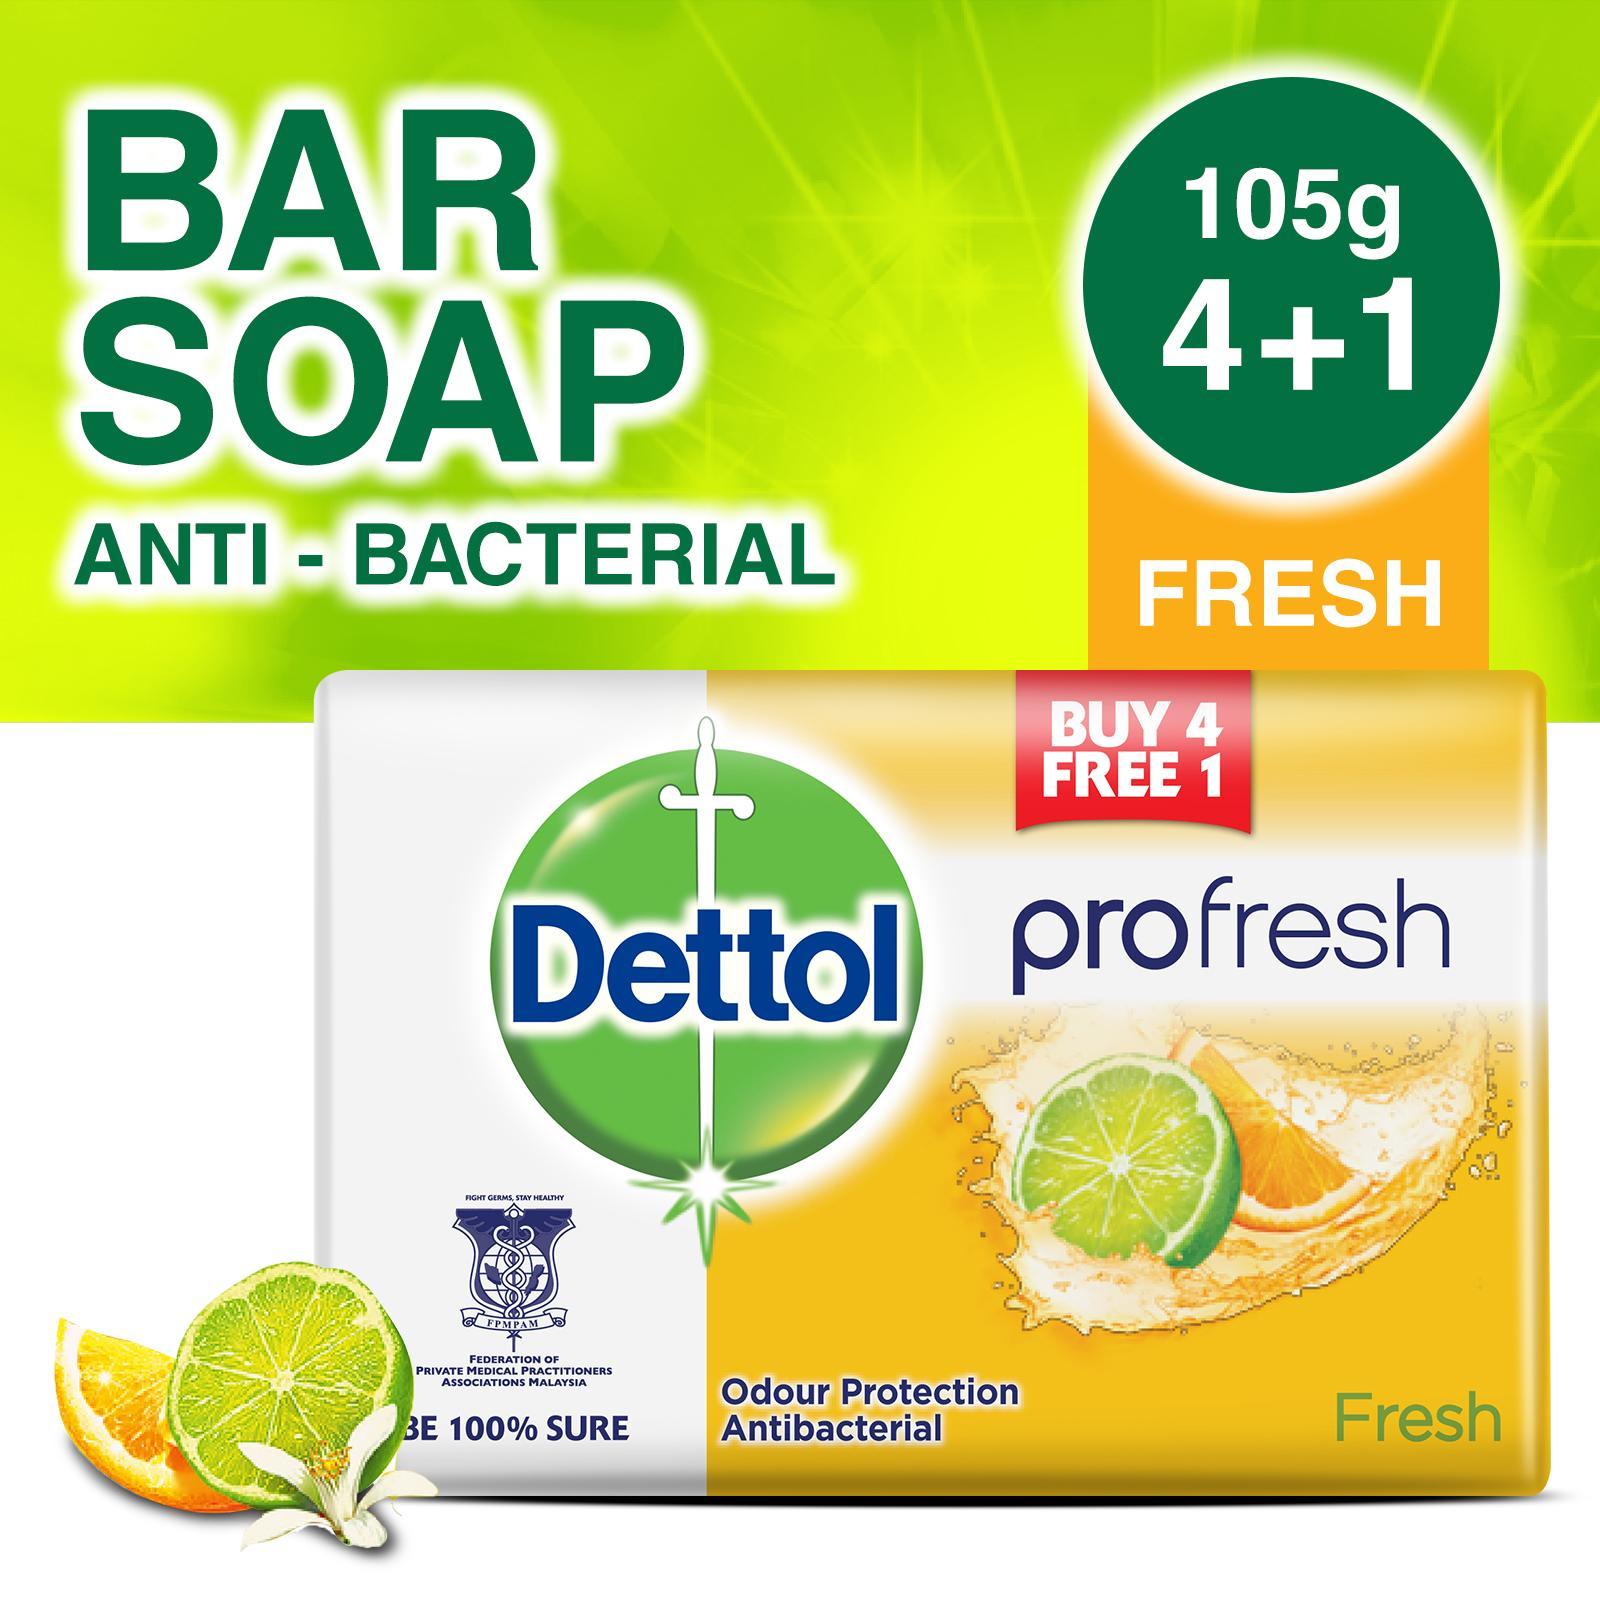 4+1 free Dettol Anti-Bacterial Bar Soap Fresh 105G